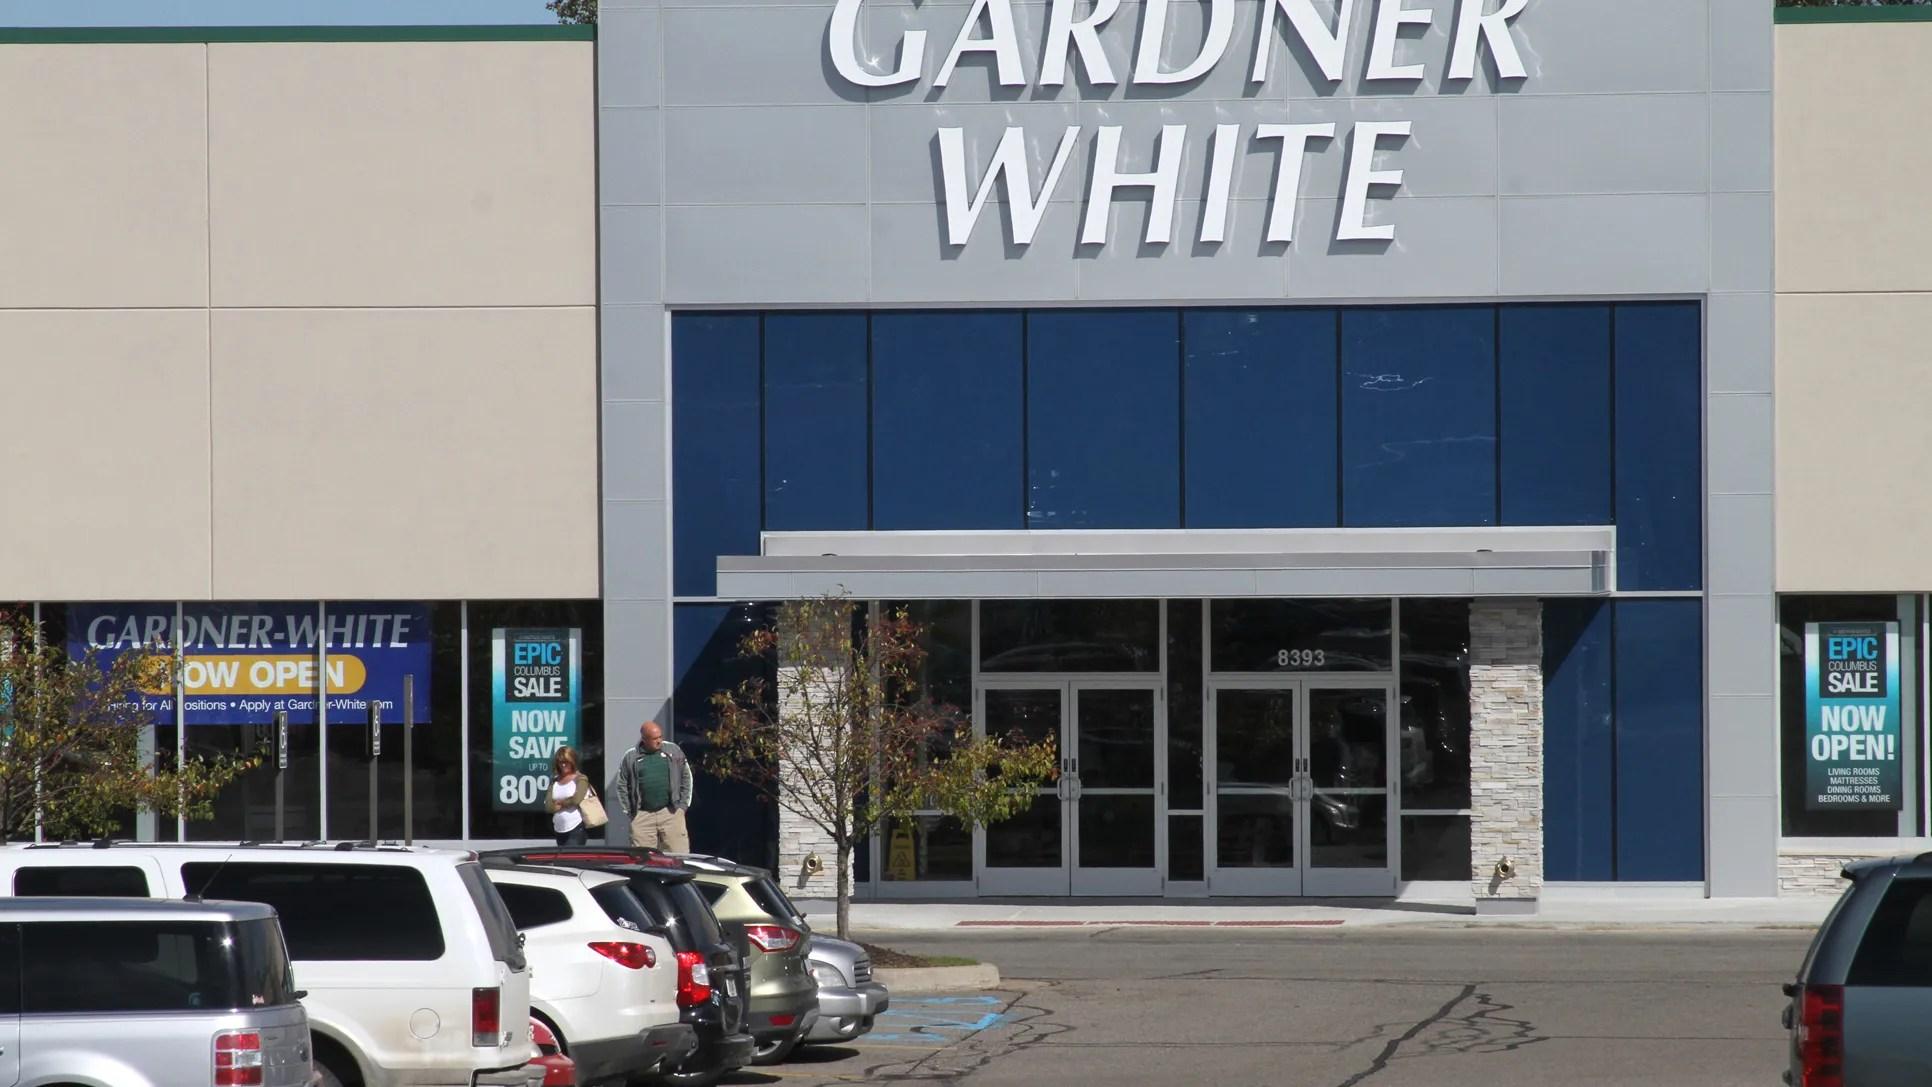 gardner white opens at brighton mall